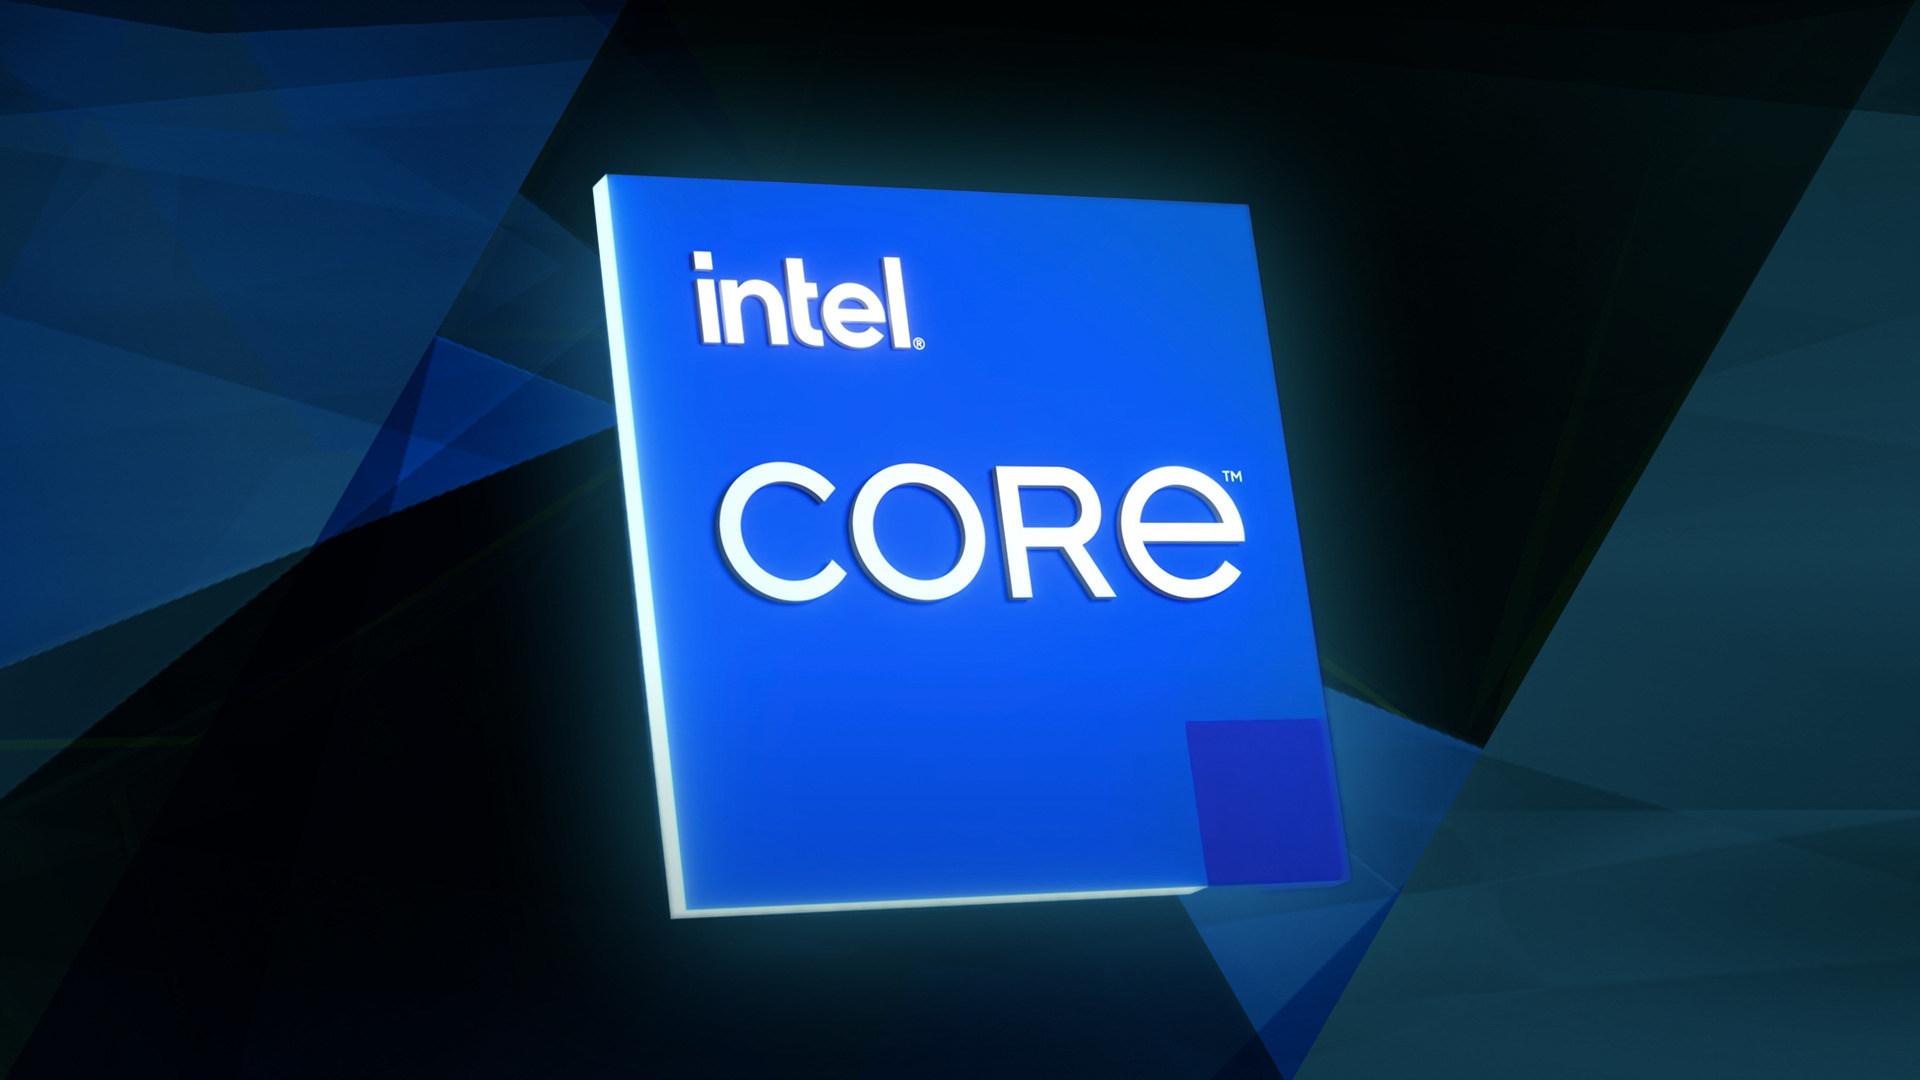 Intel, Prozessor, Logo, Cpu, Chip, Prozessoren, Intel Core i7, Intel Core i5, Intel Core, Core i7, Intel Core i3, Core i5, Intel CPU, Intel Logo, Neues Intel Logo, Intel Logo 2020